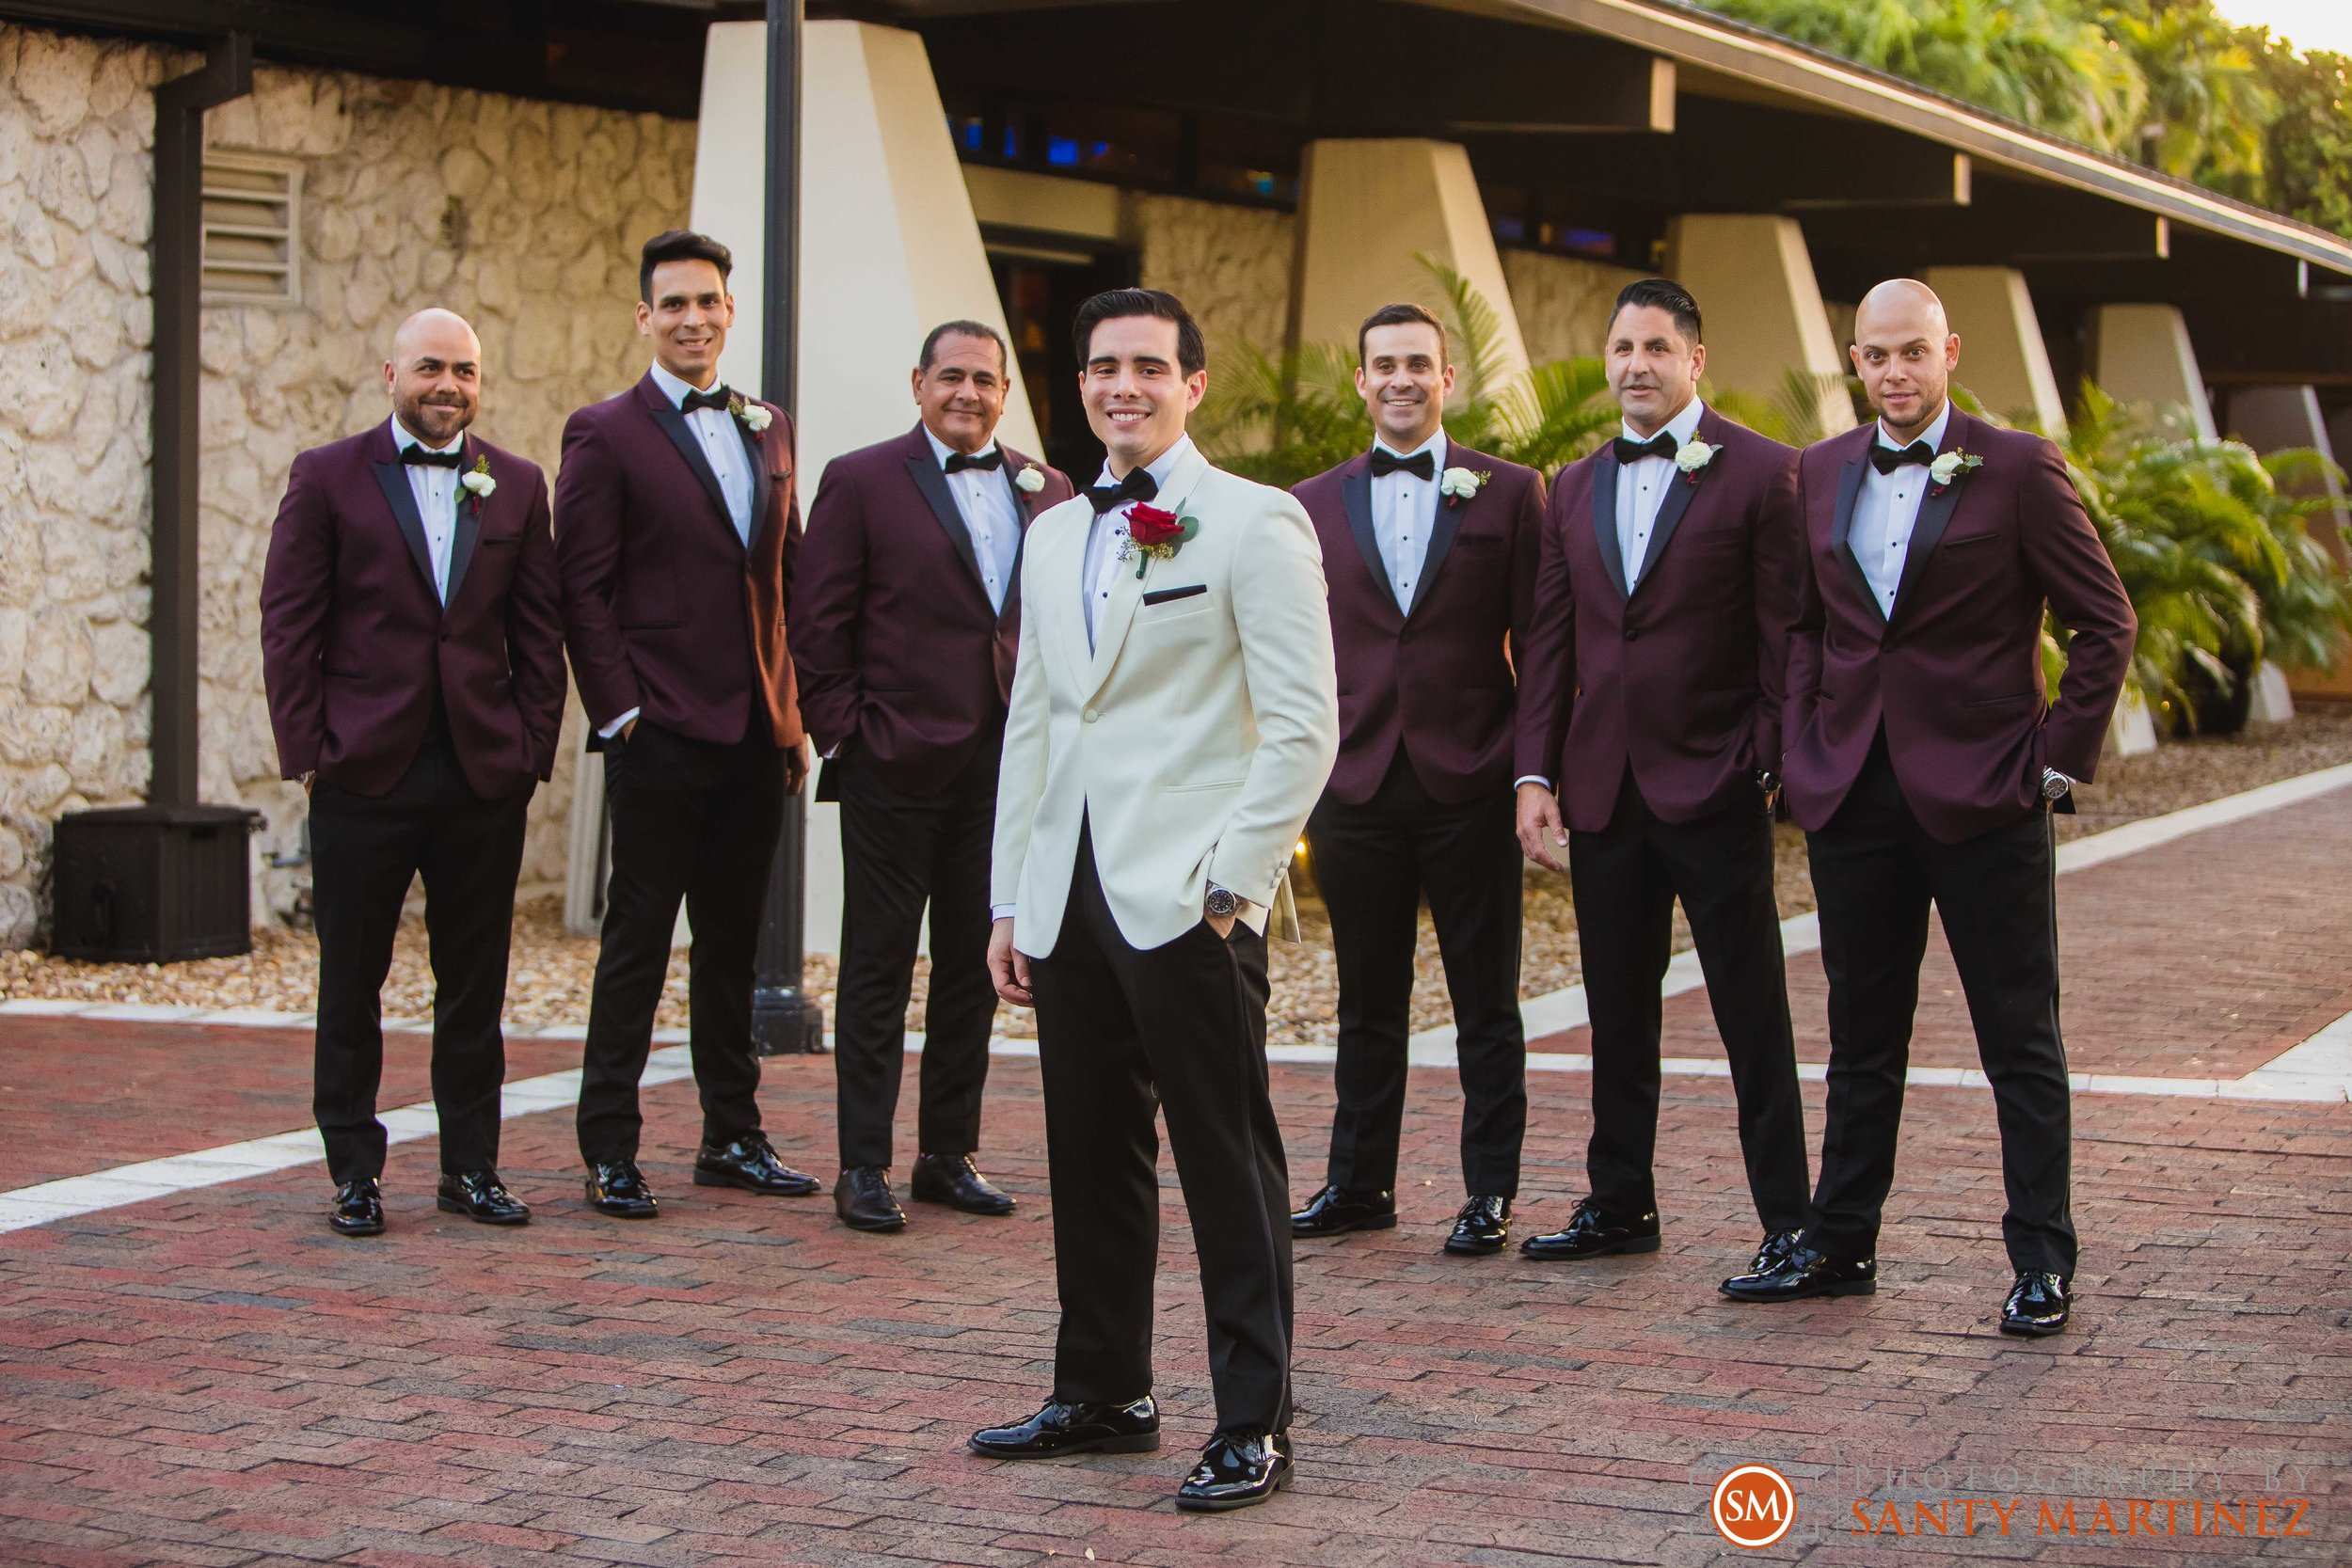 Wedding - Doral Trump - St Hugh Church - Curtiss Mansion_-39.jpg